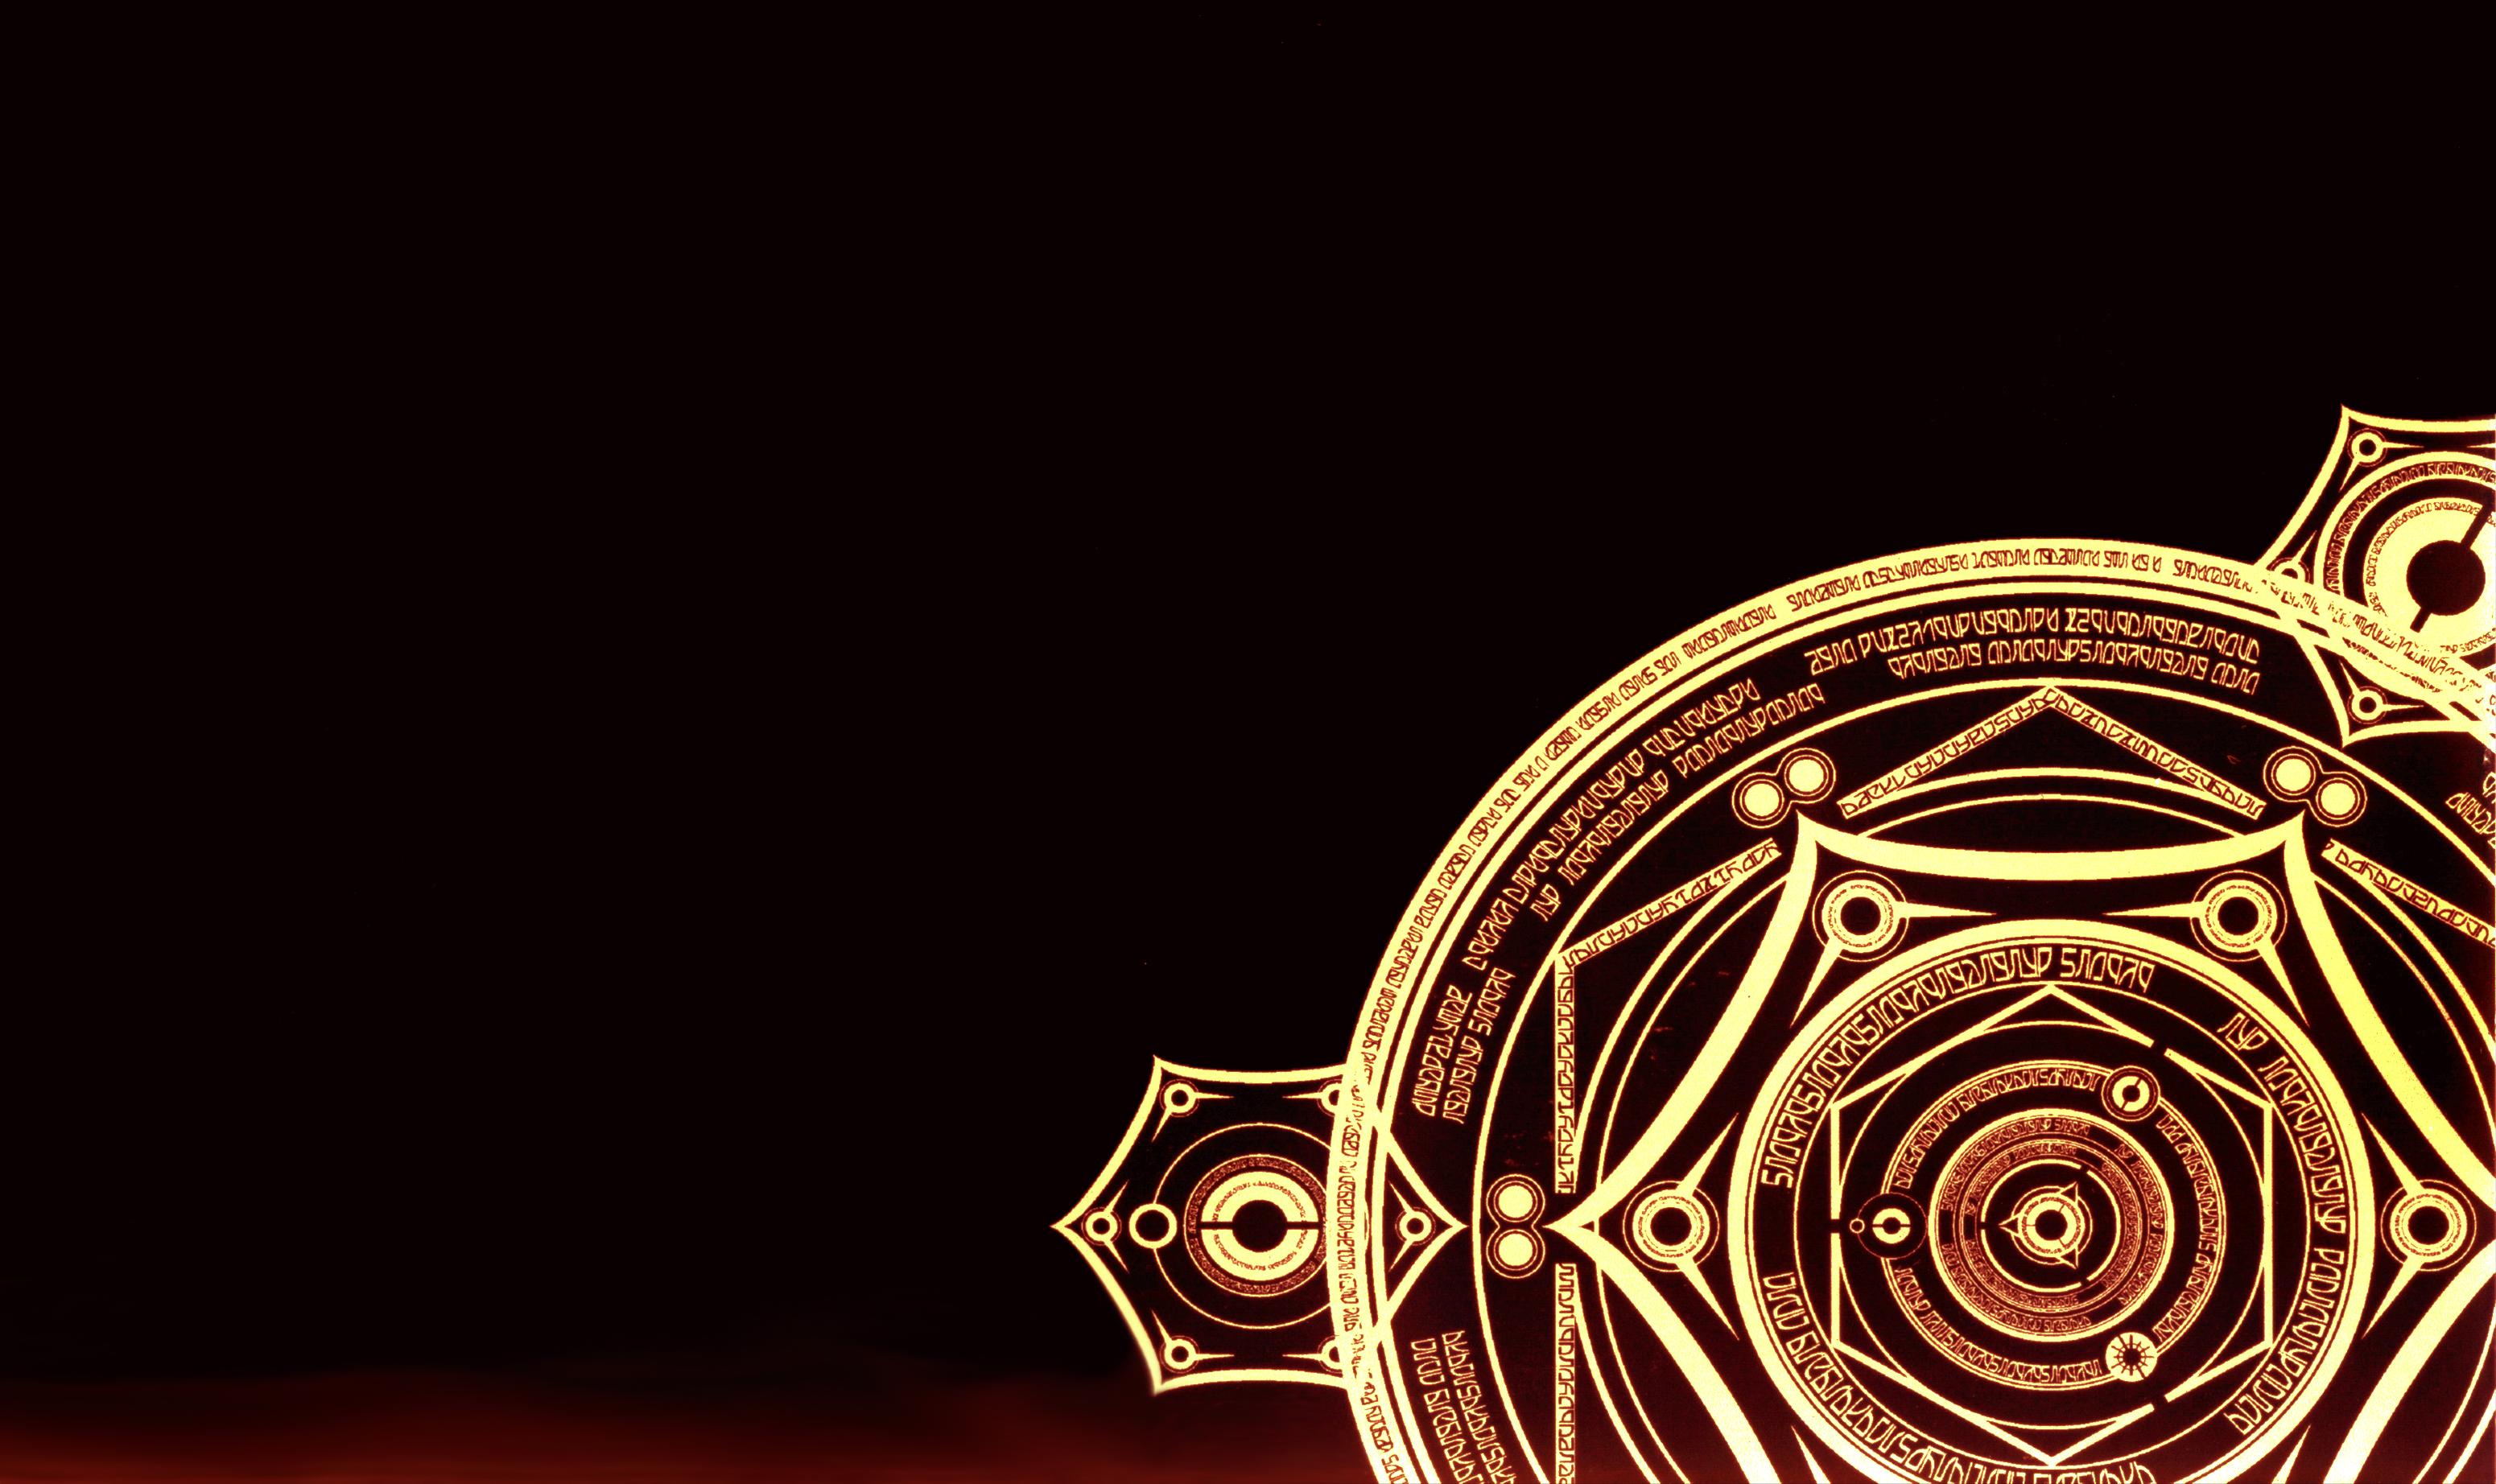 Phantasy Star Online 2 Wallpaper: Phantasy Star Universe Custom Wallpaper 2 By Demi-feind On